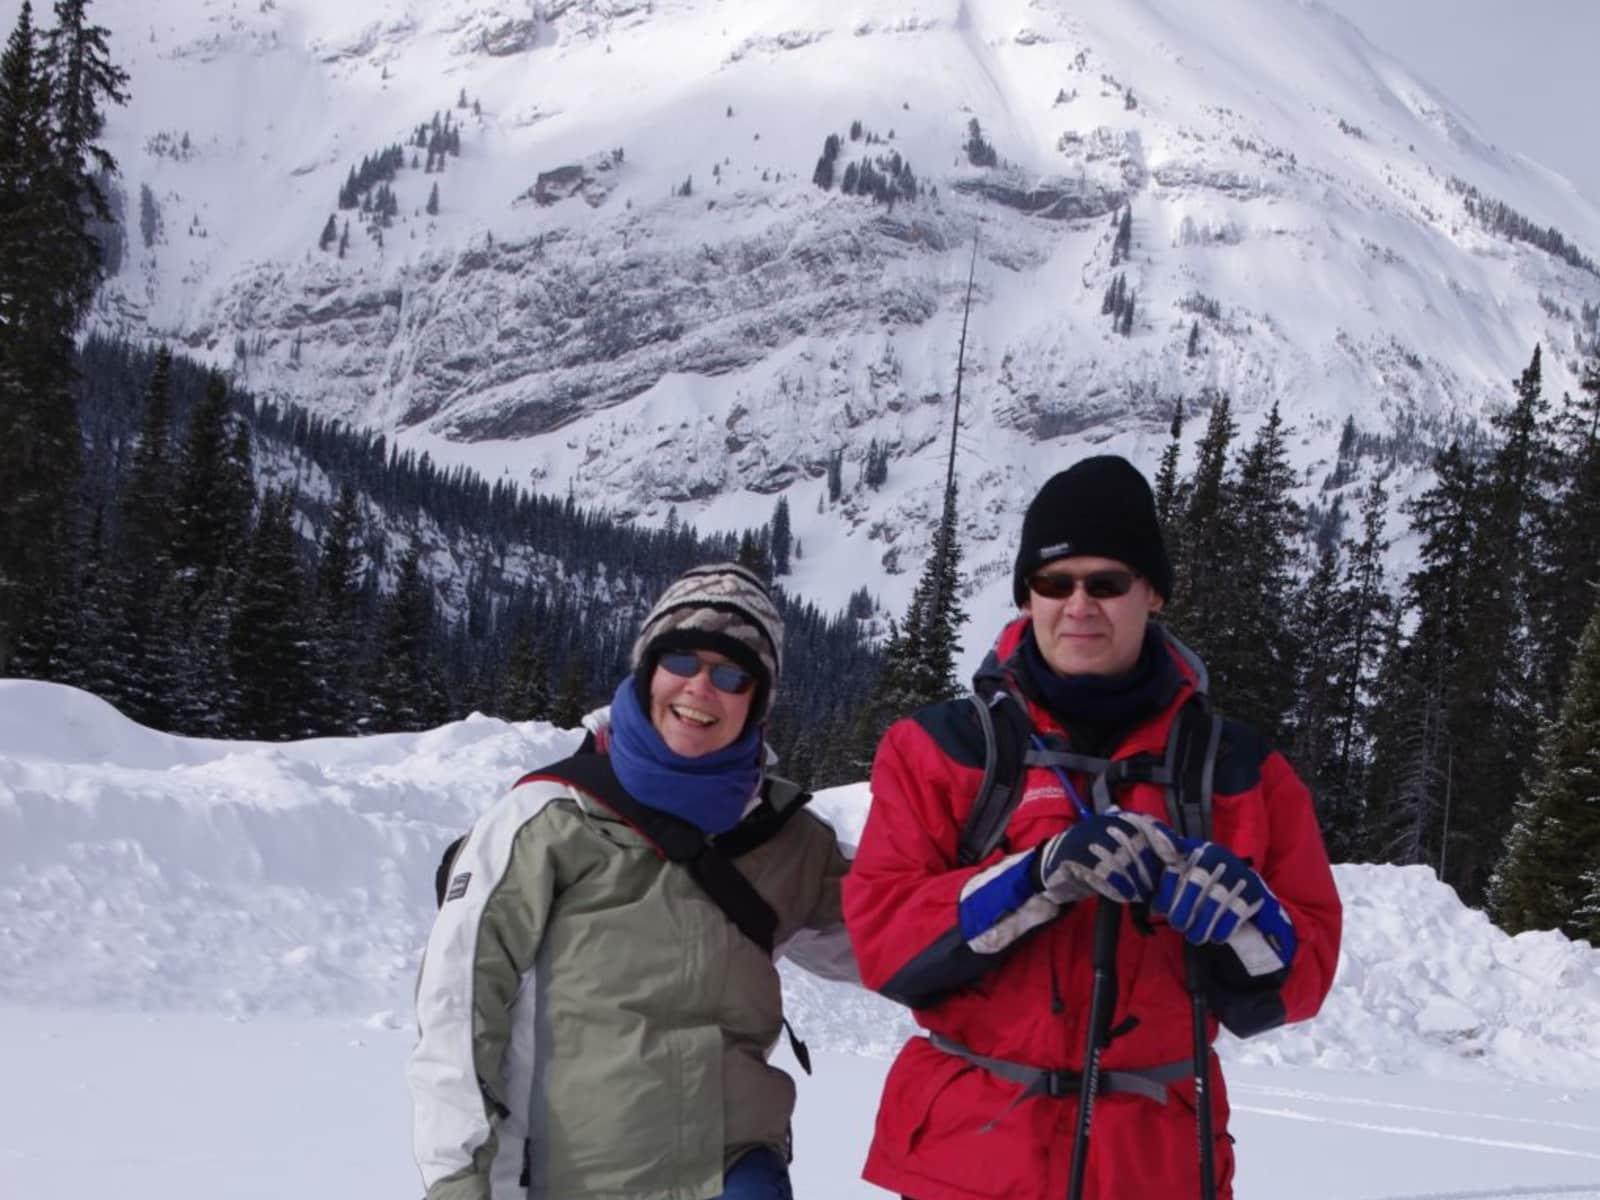 Ian & Lori from Swift Current, Saskatchewan, Canada